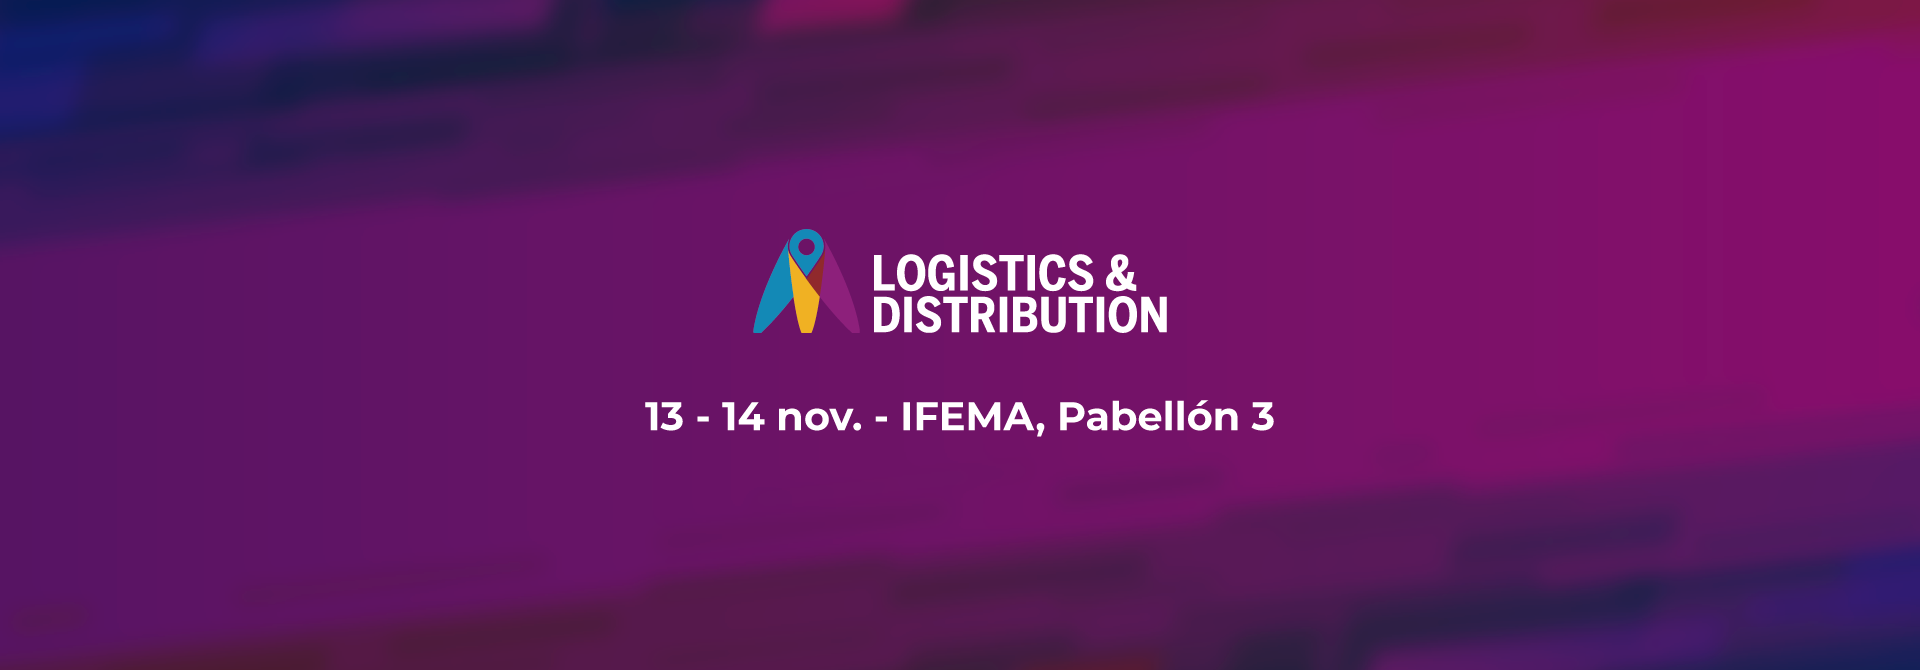 Logistics & Distribition 2019